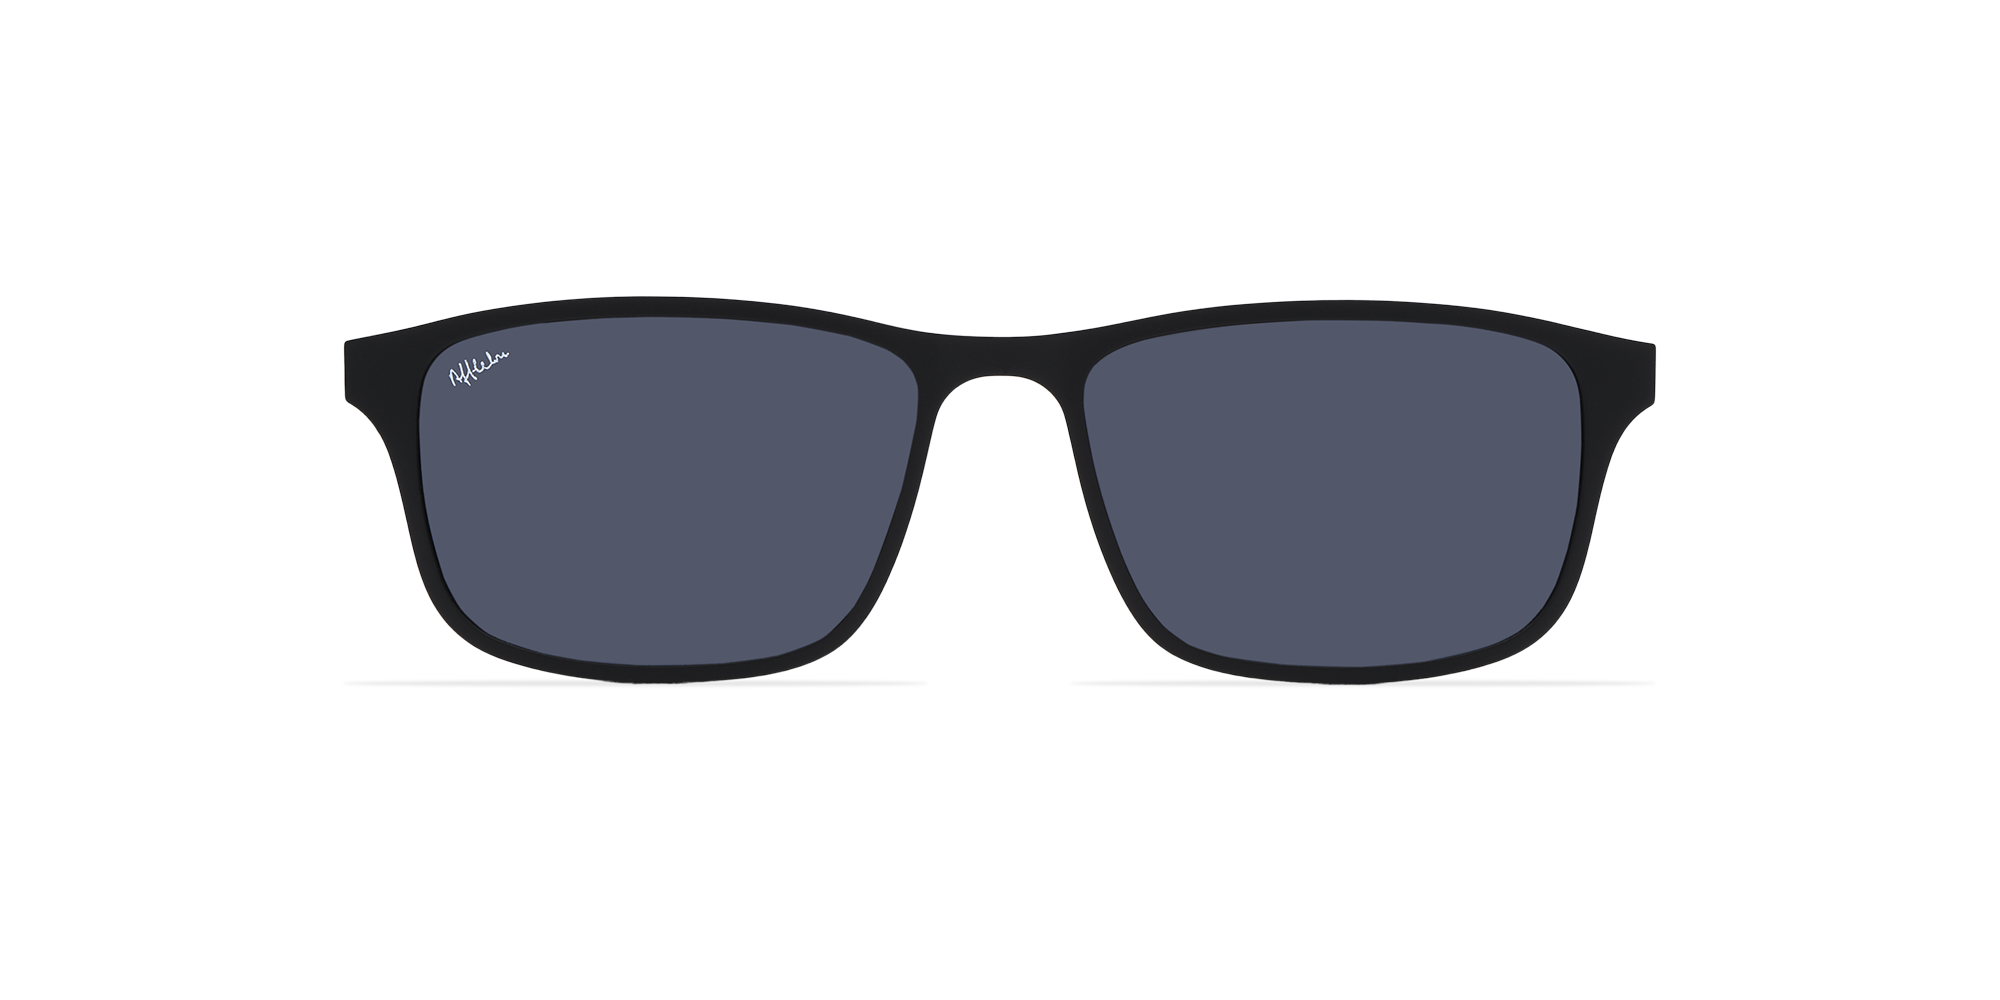 afflelou/france/products/smart_clip/clips_glasses/TMK41SUBK015416.png